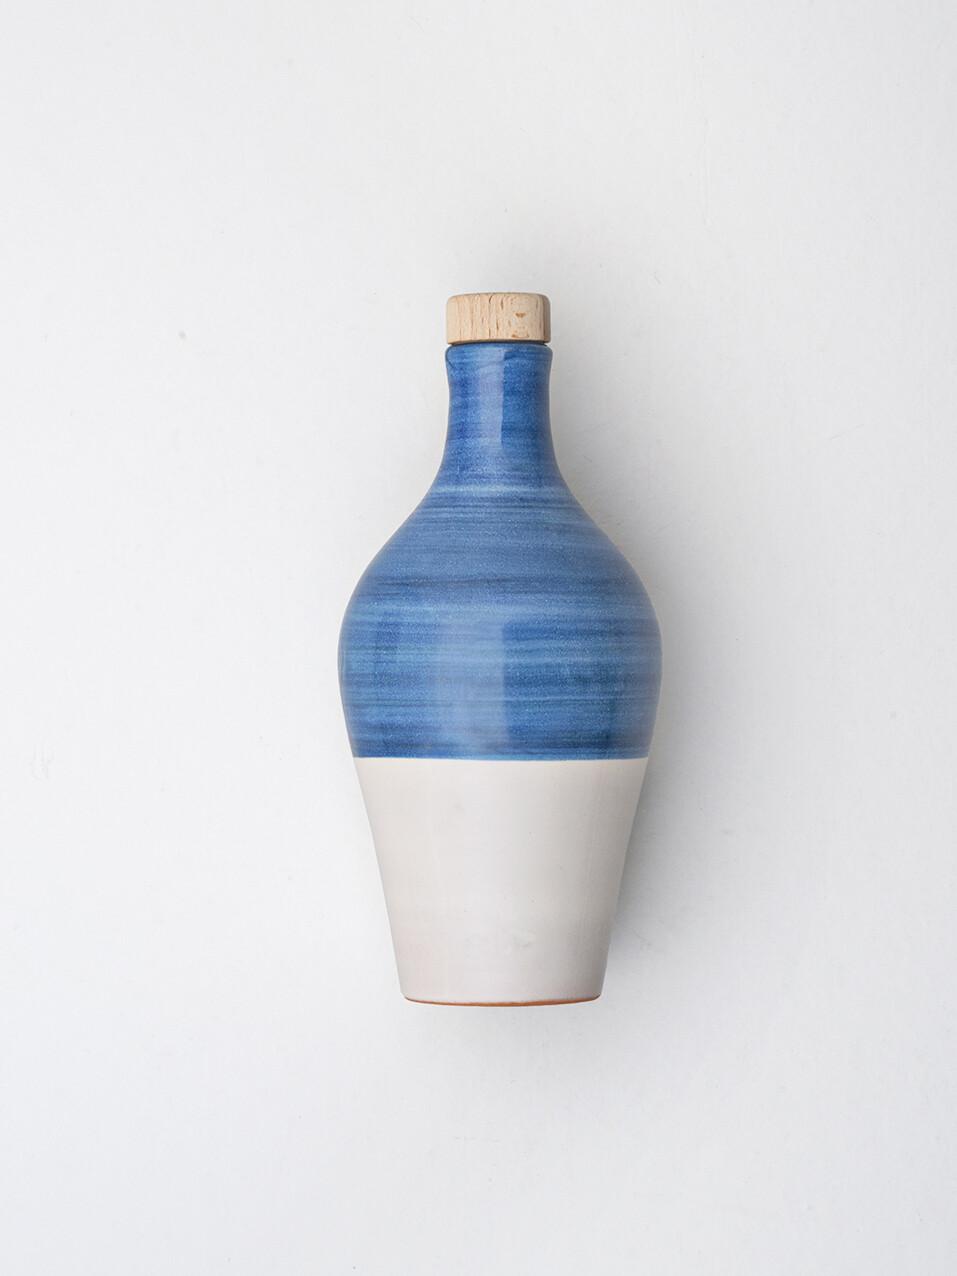 La Fiaschetta Extra Natives Olivenöl,  470ml Keramikkrug in Blau